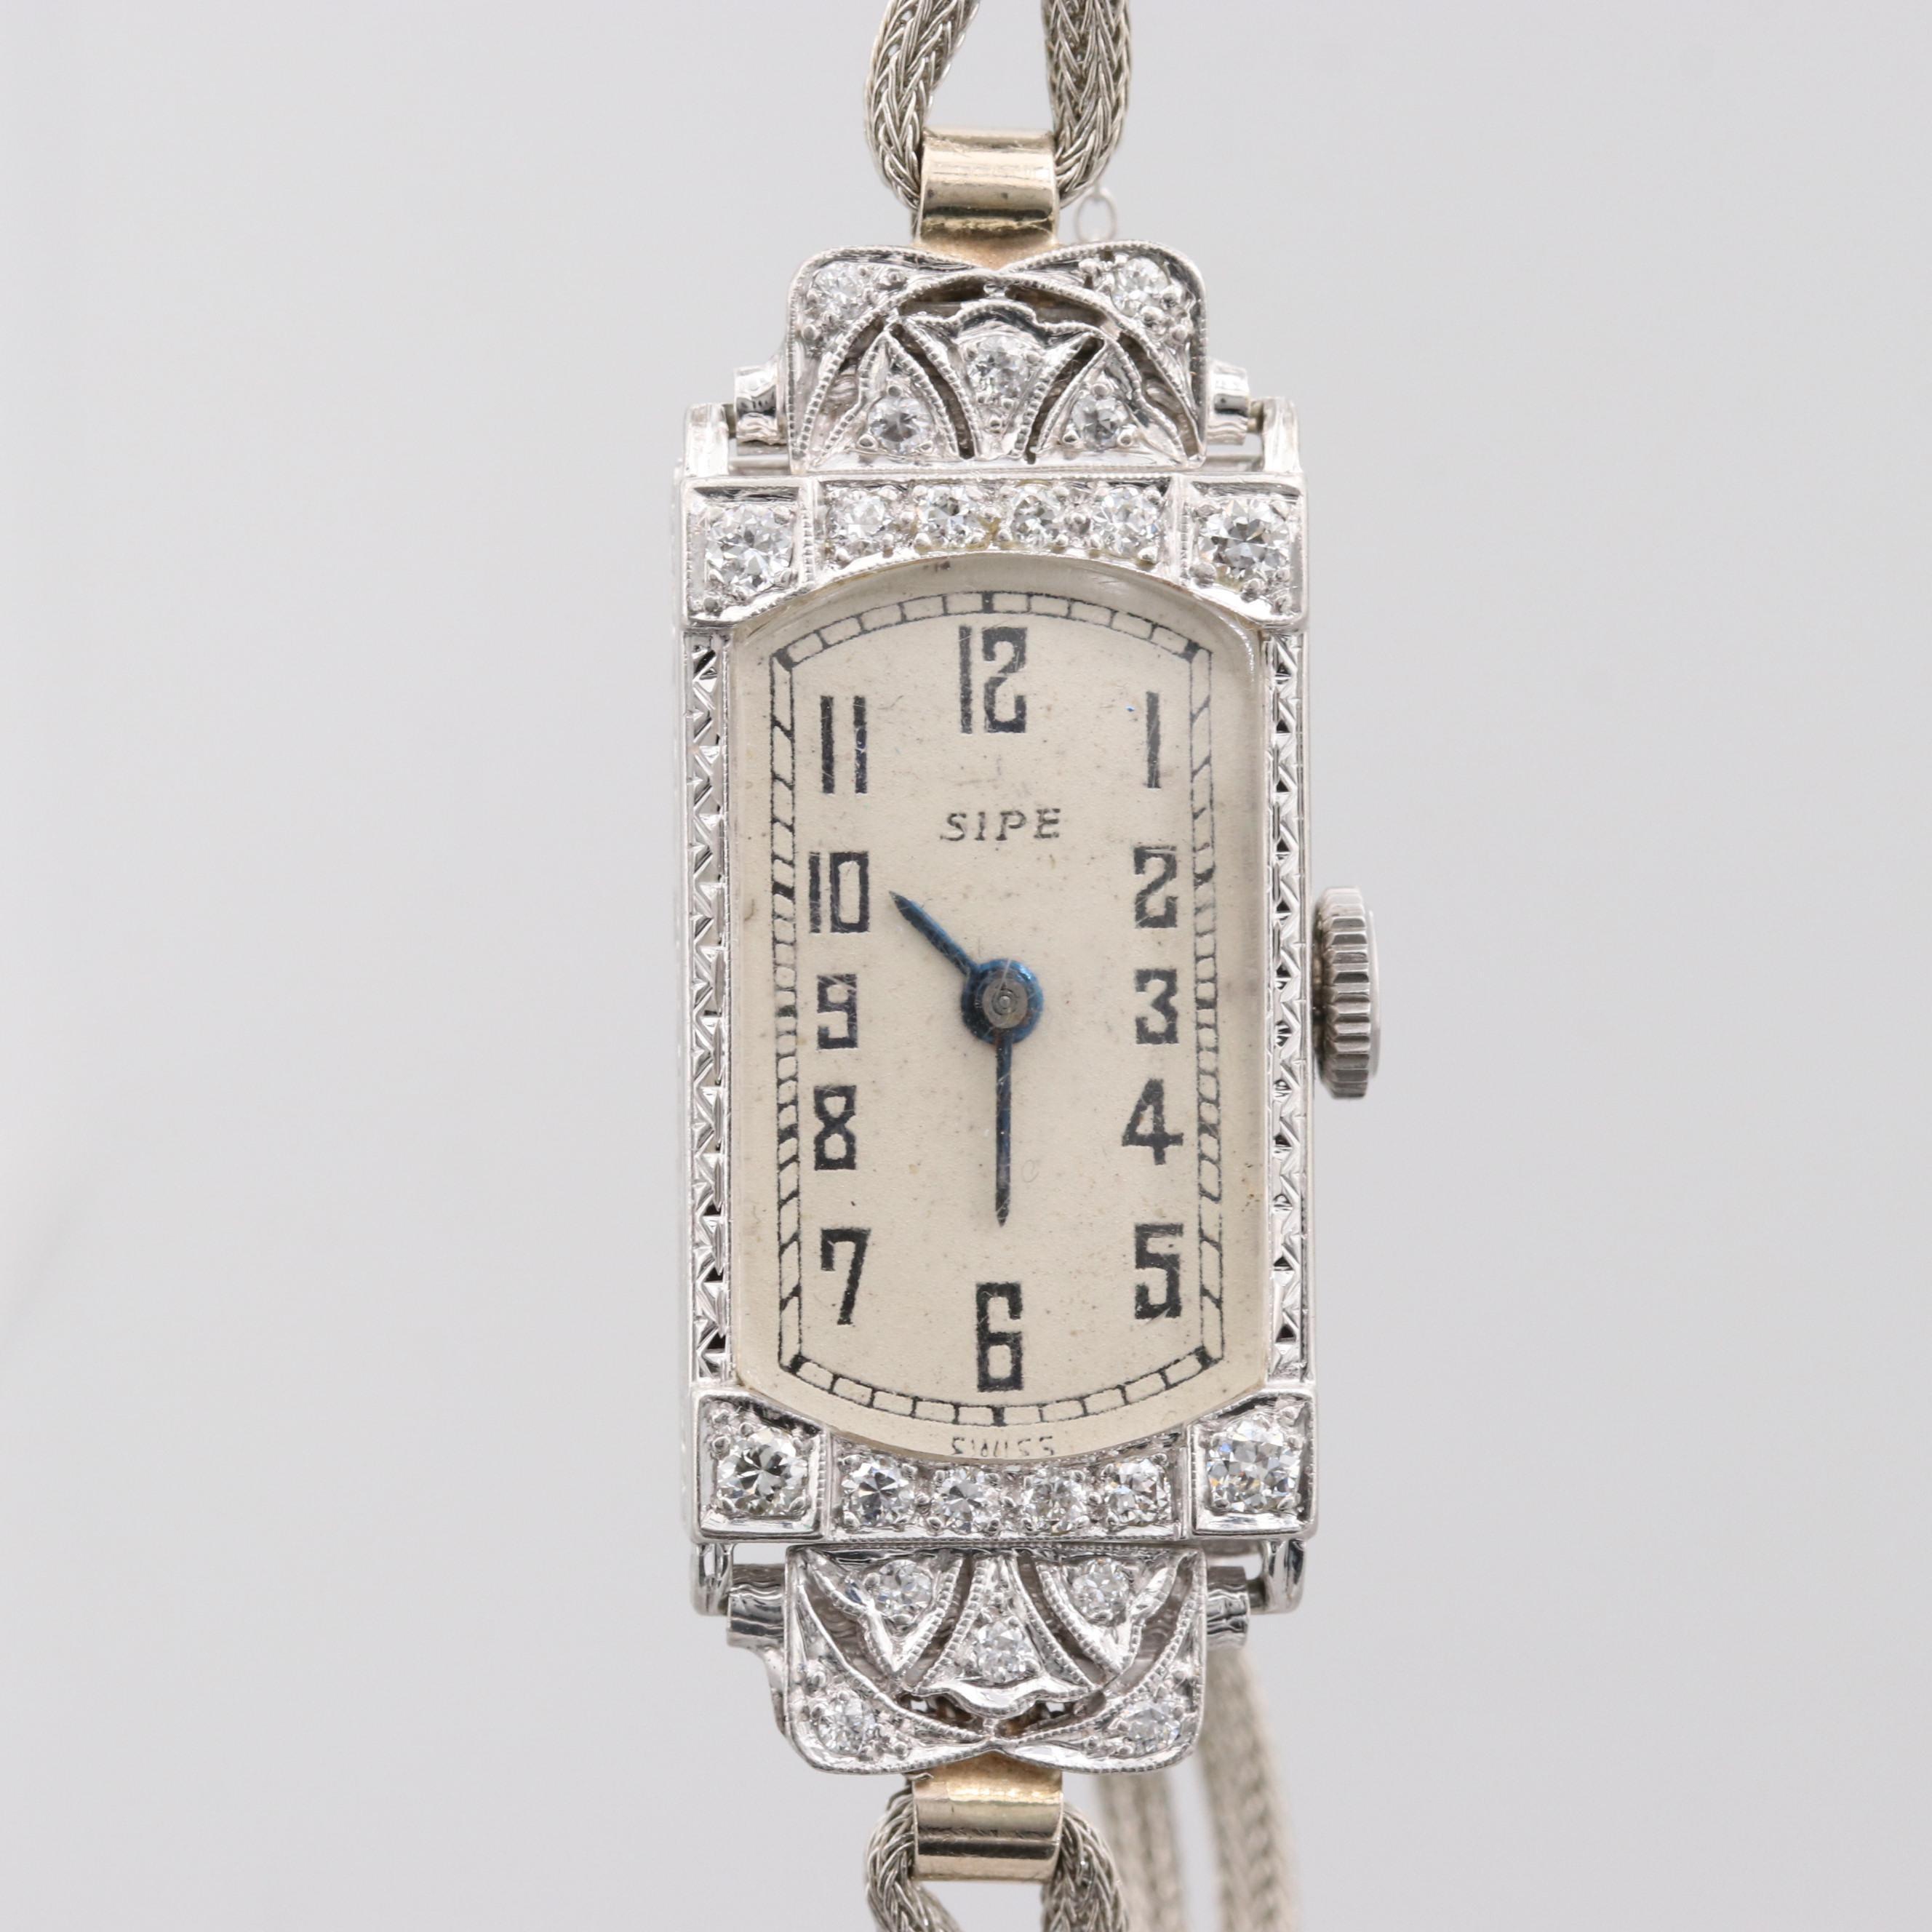 Concord 18K White Gold Wristwatch With Diamonds